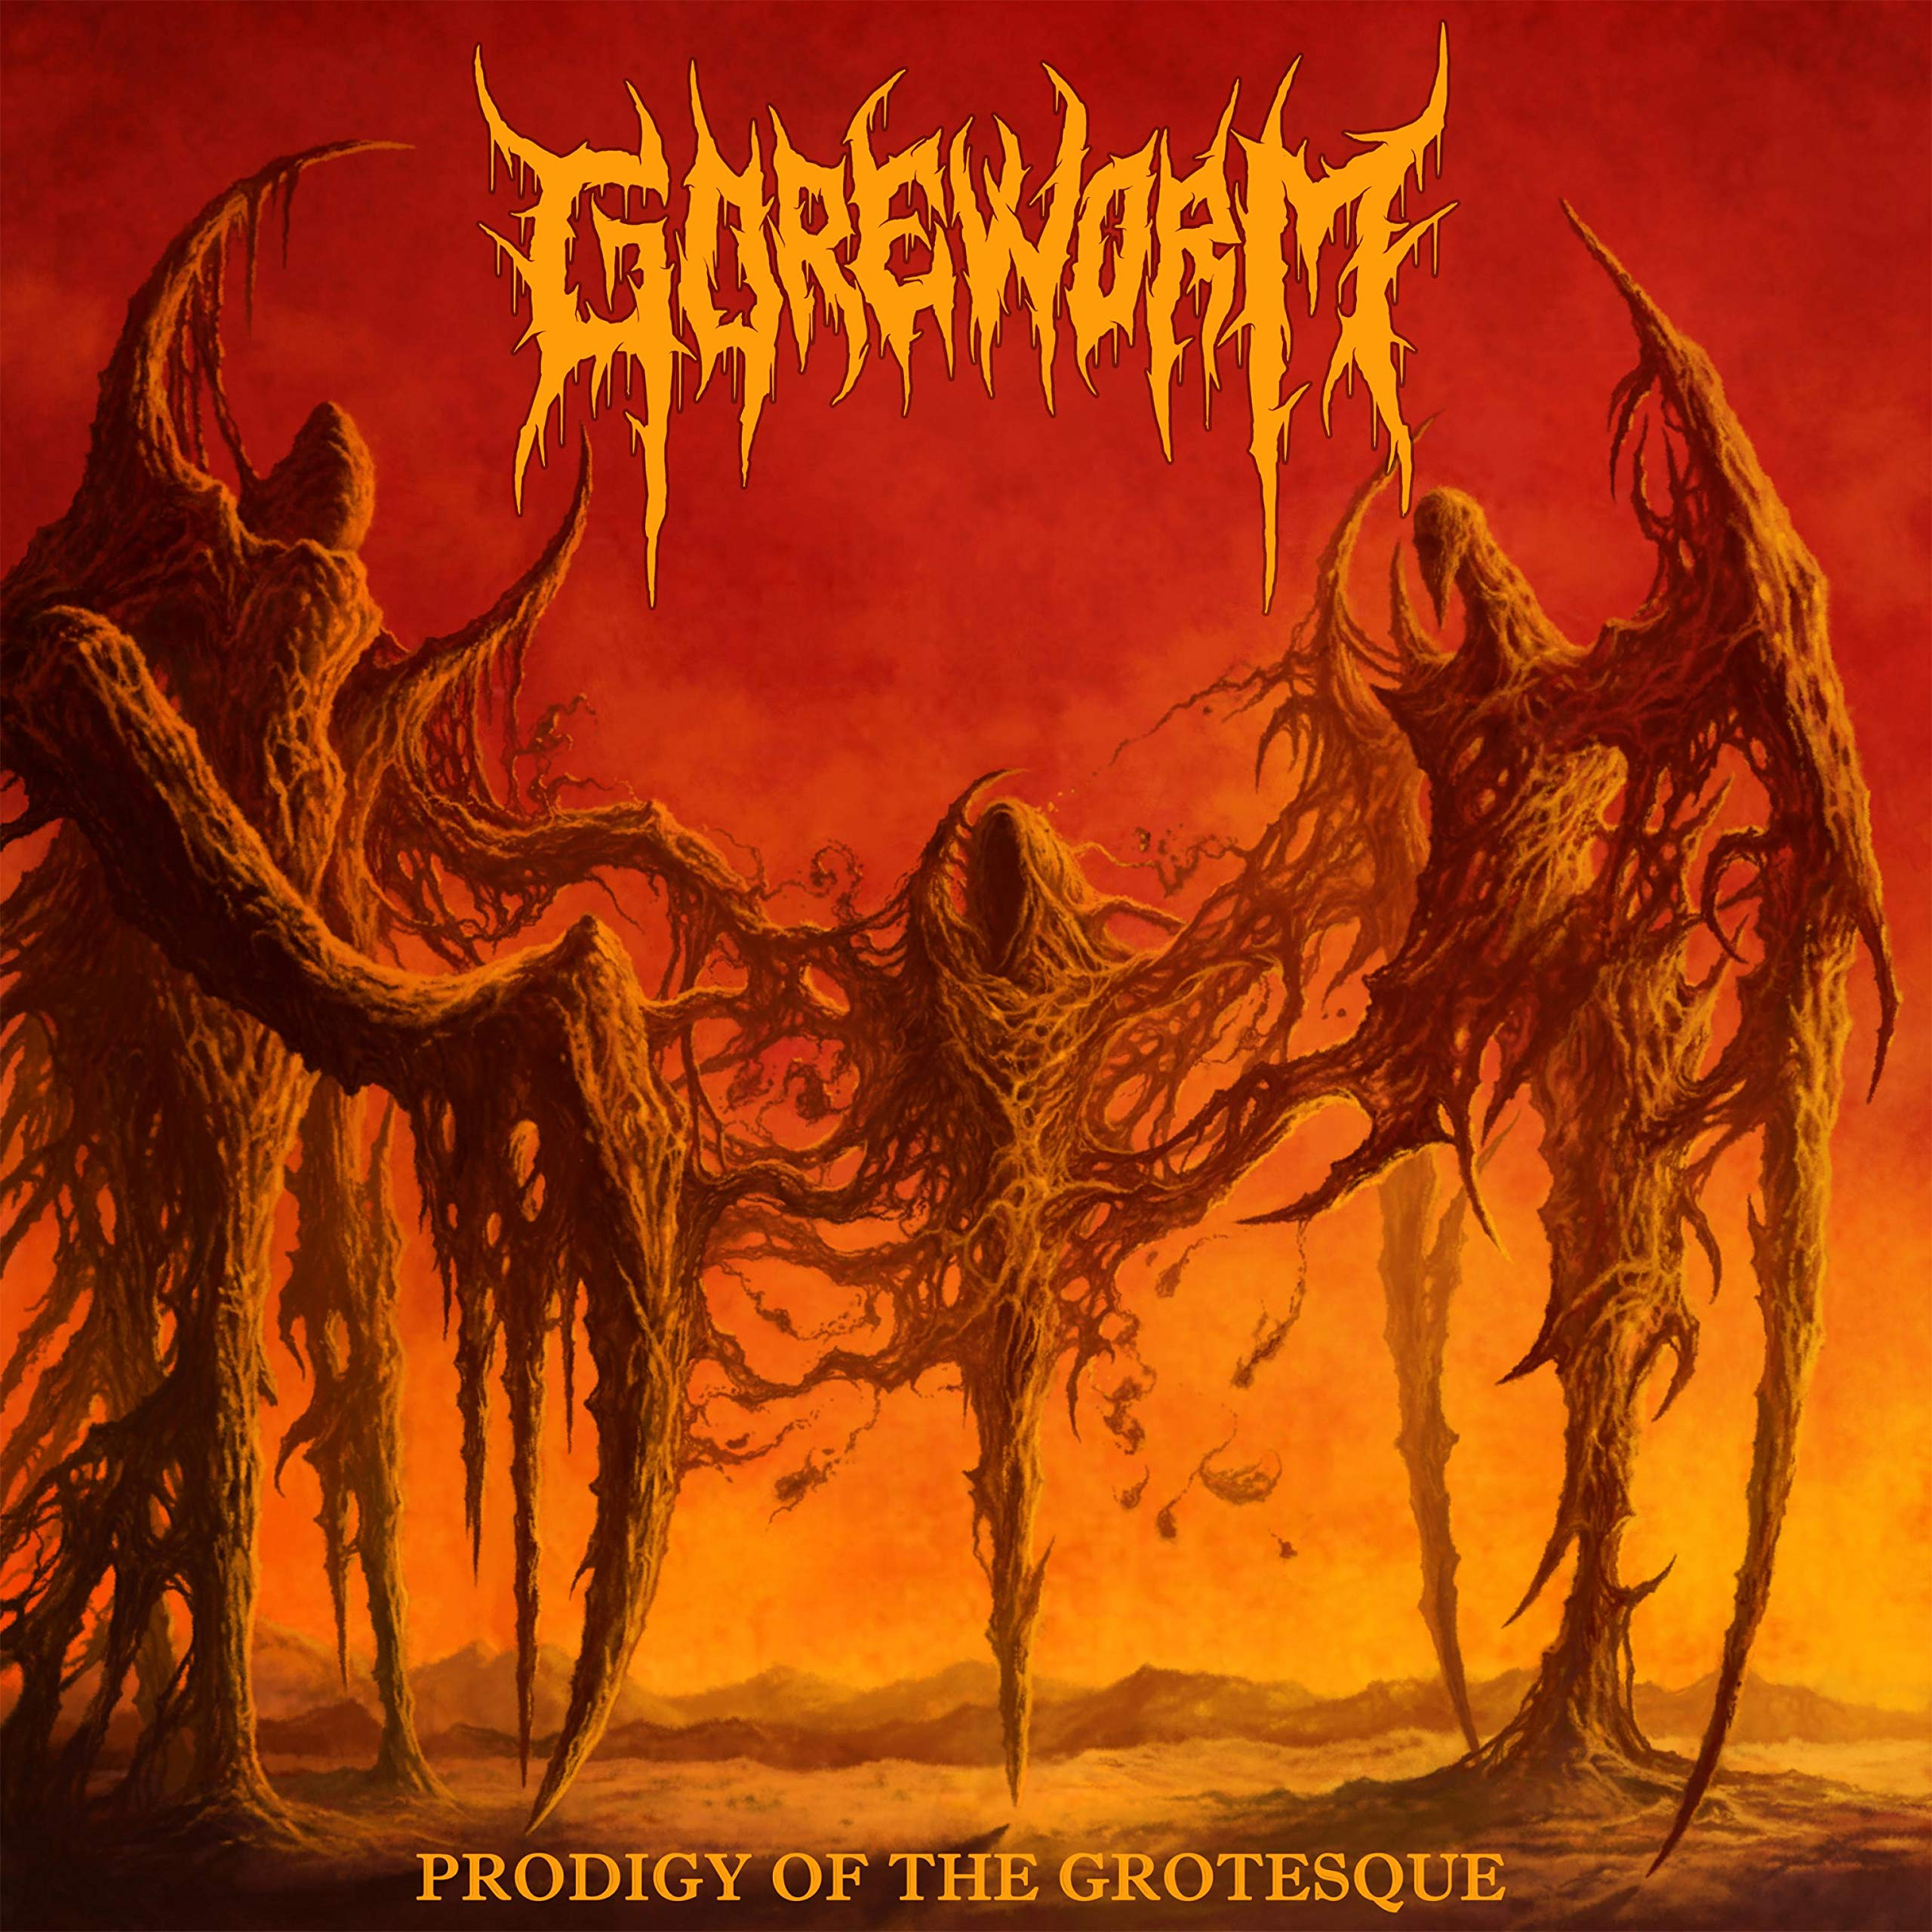 Goreworm-Prodigy of the Grotesque-CD-FLAC-2020-86D